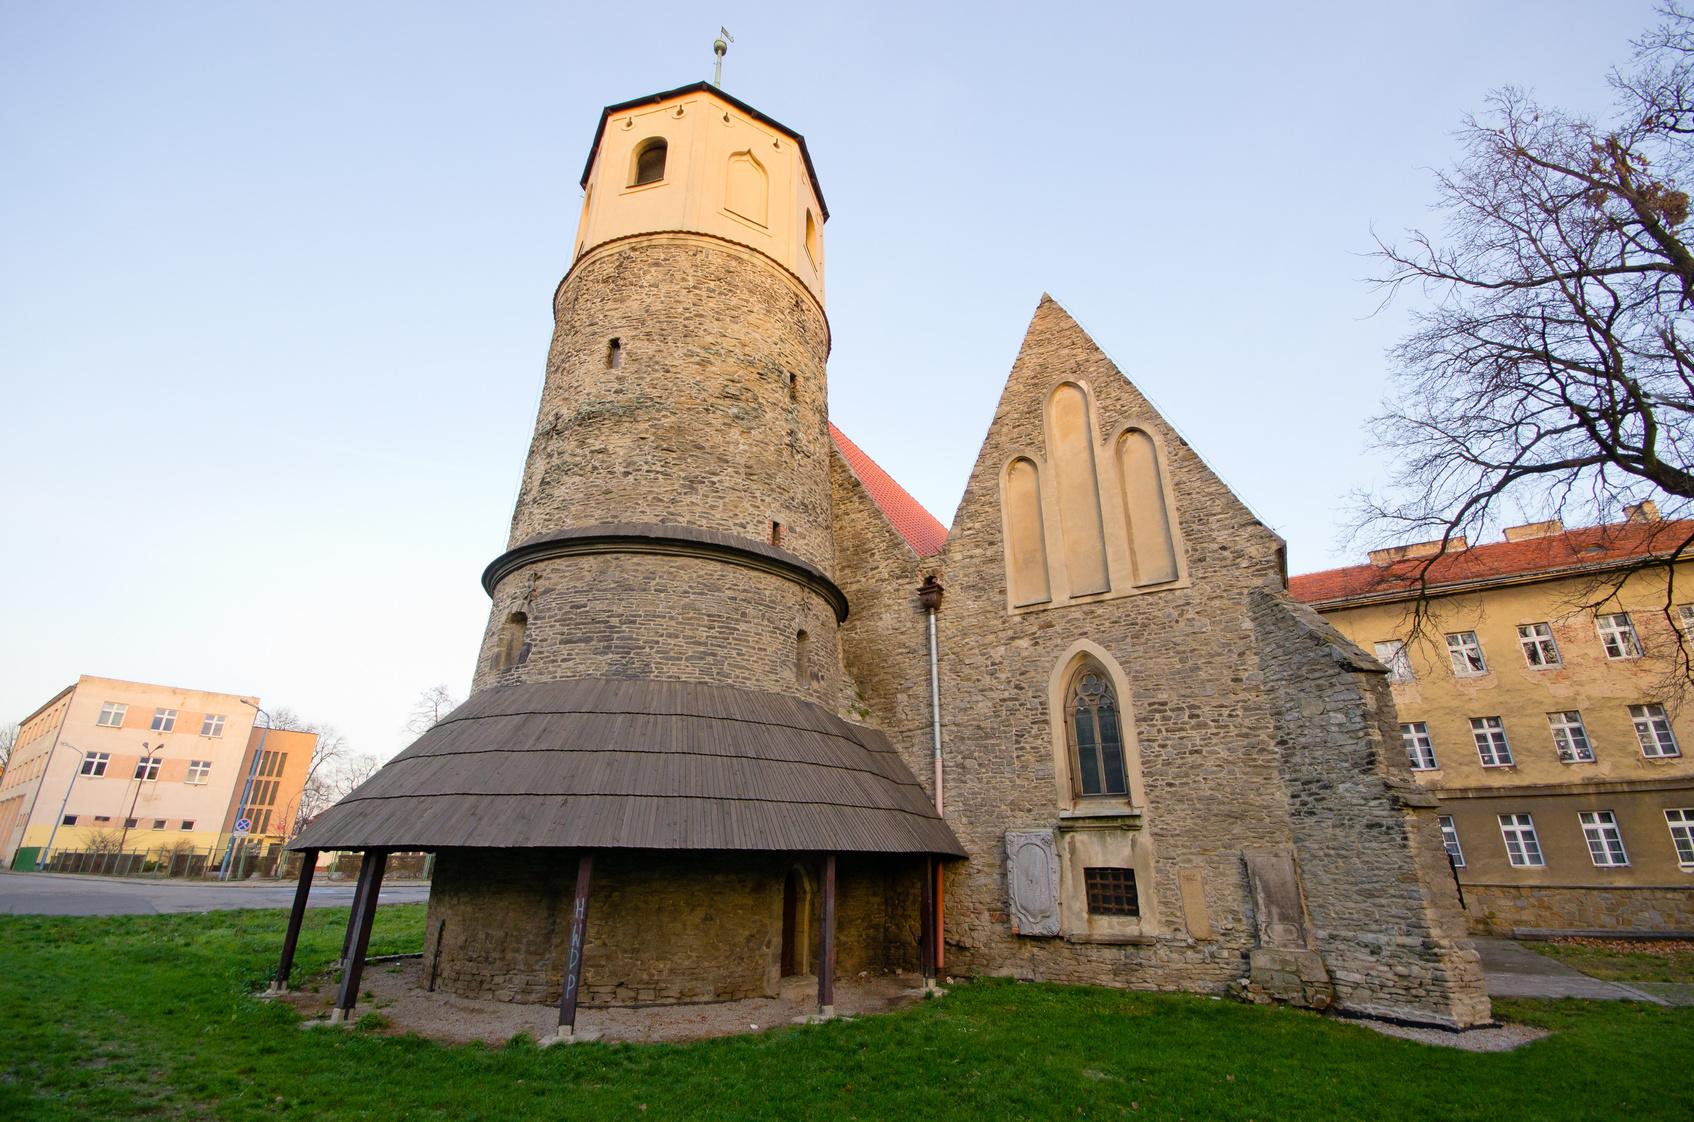 St. Gotard's rotunde in Strzelin - Poland